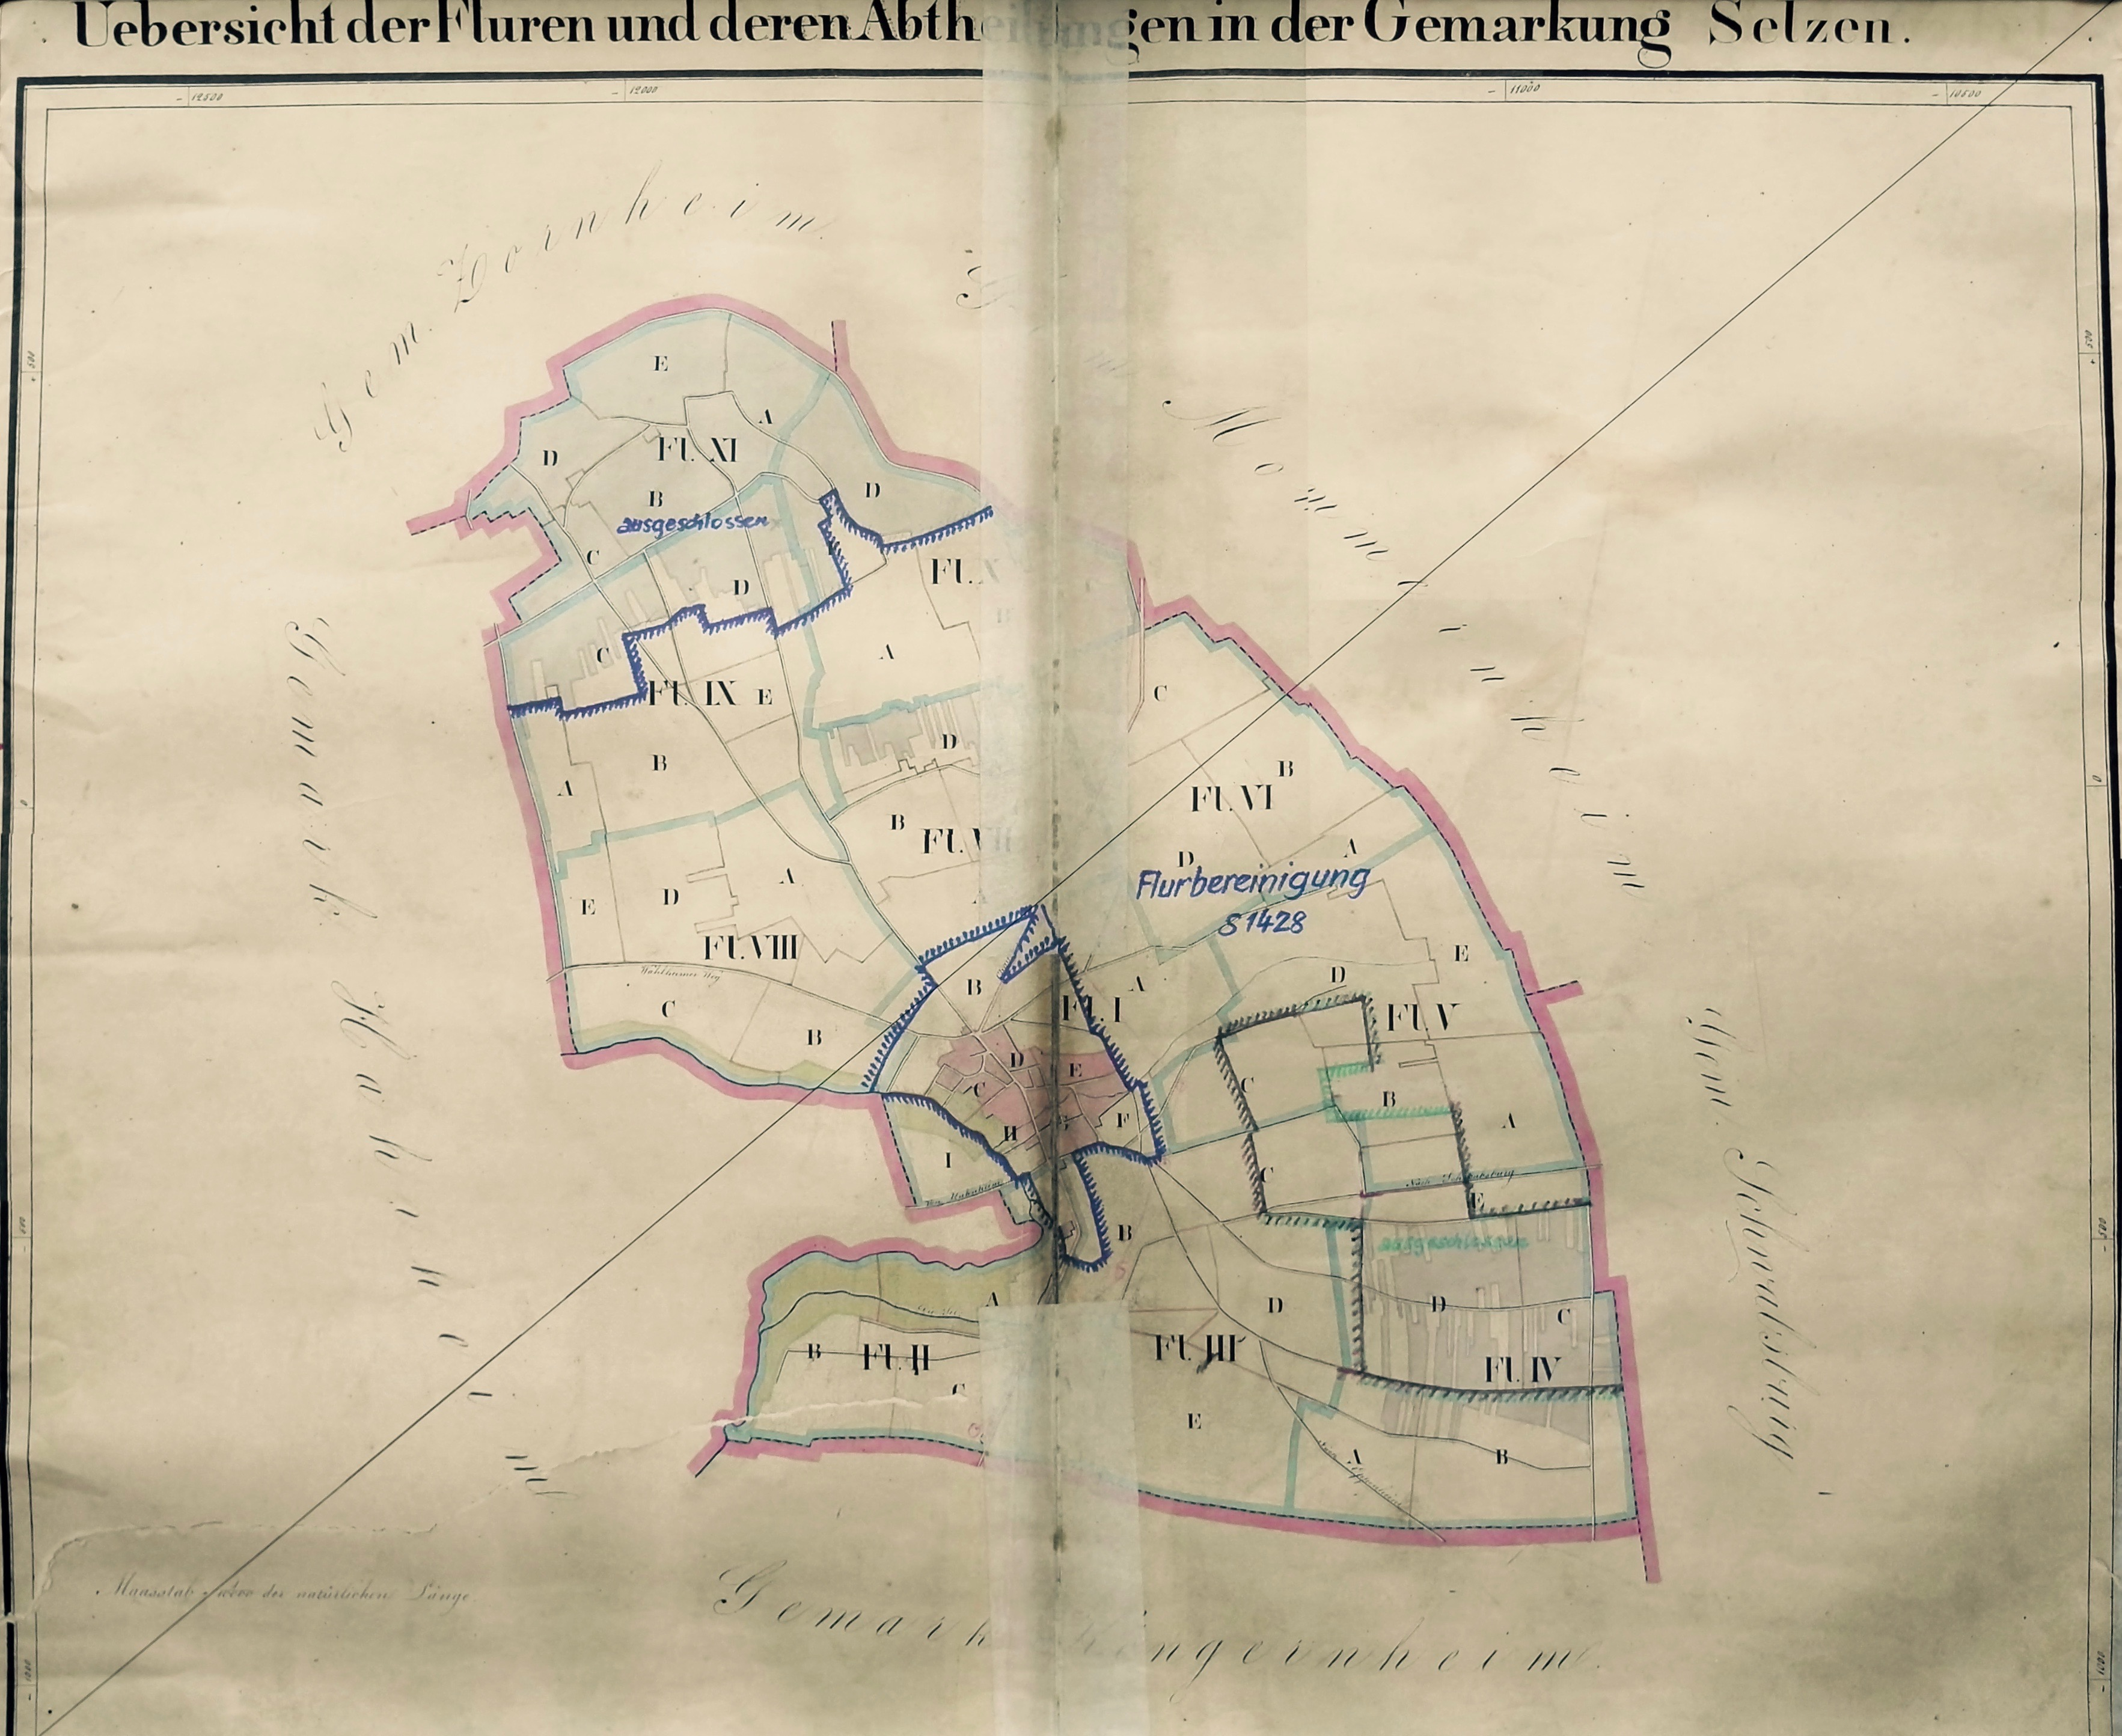 1912: Gemarkung Selzen